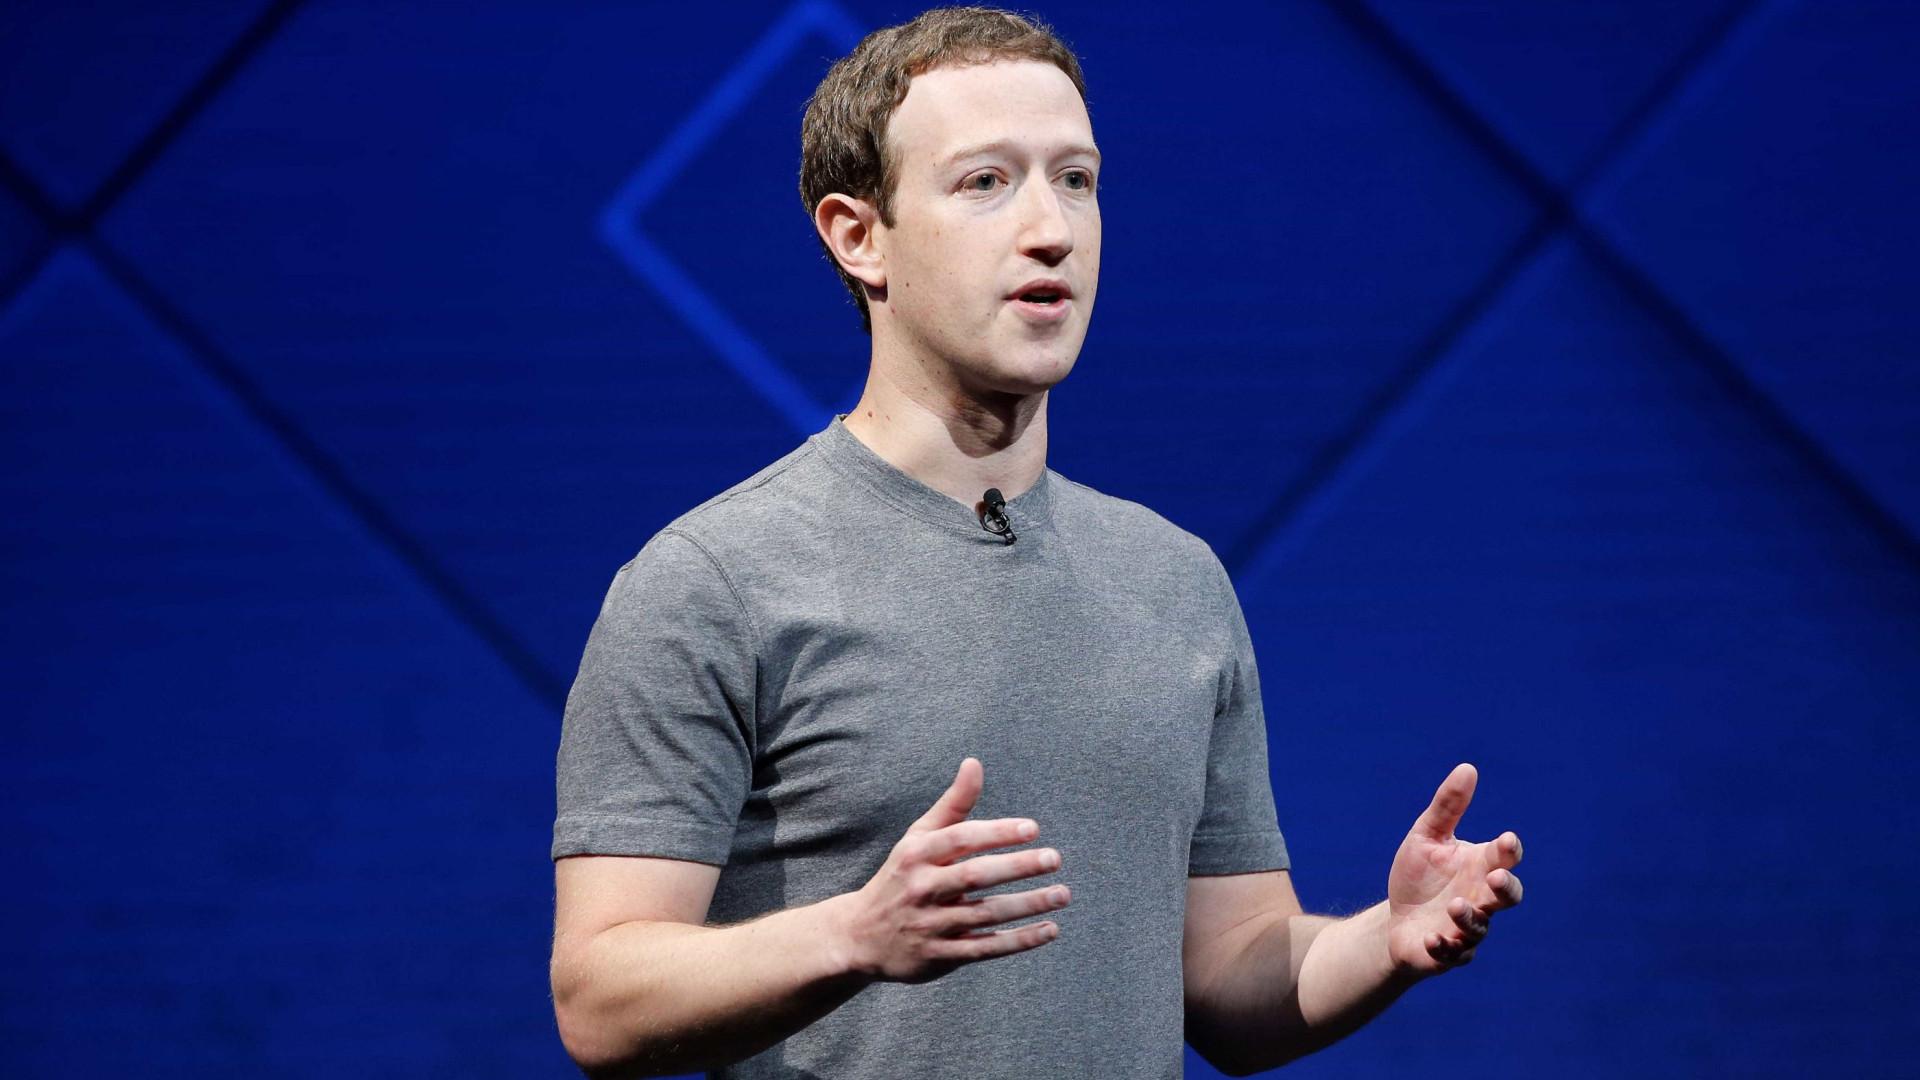 Facebook: Zuckerberg quer impedir interferência nas eleições do Brasil